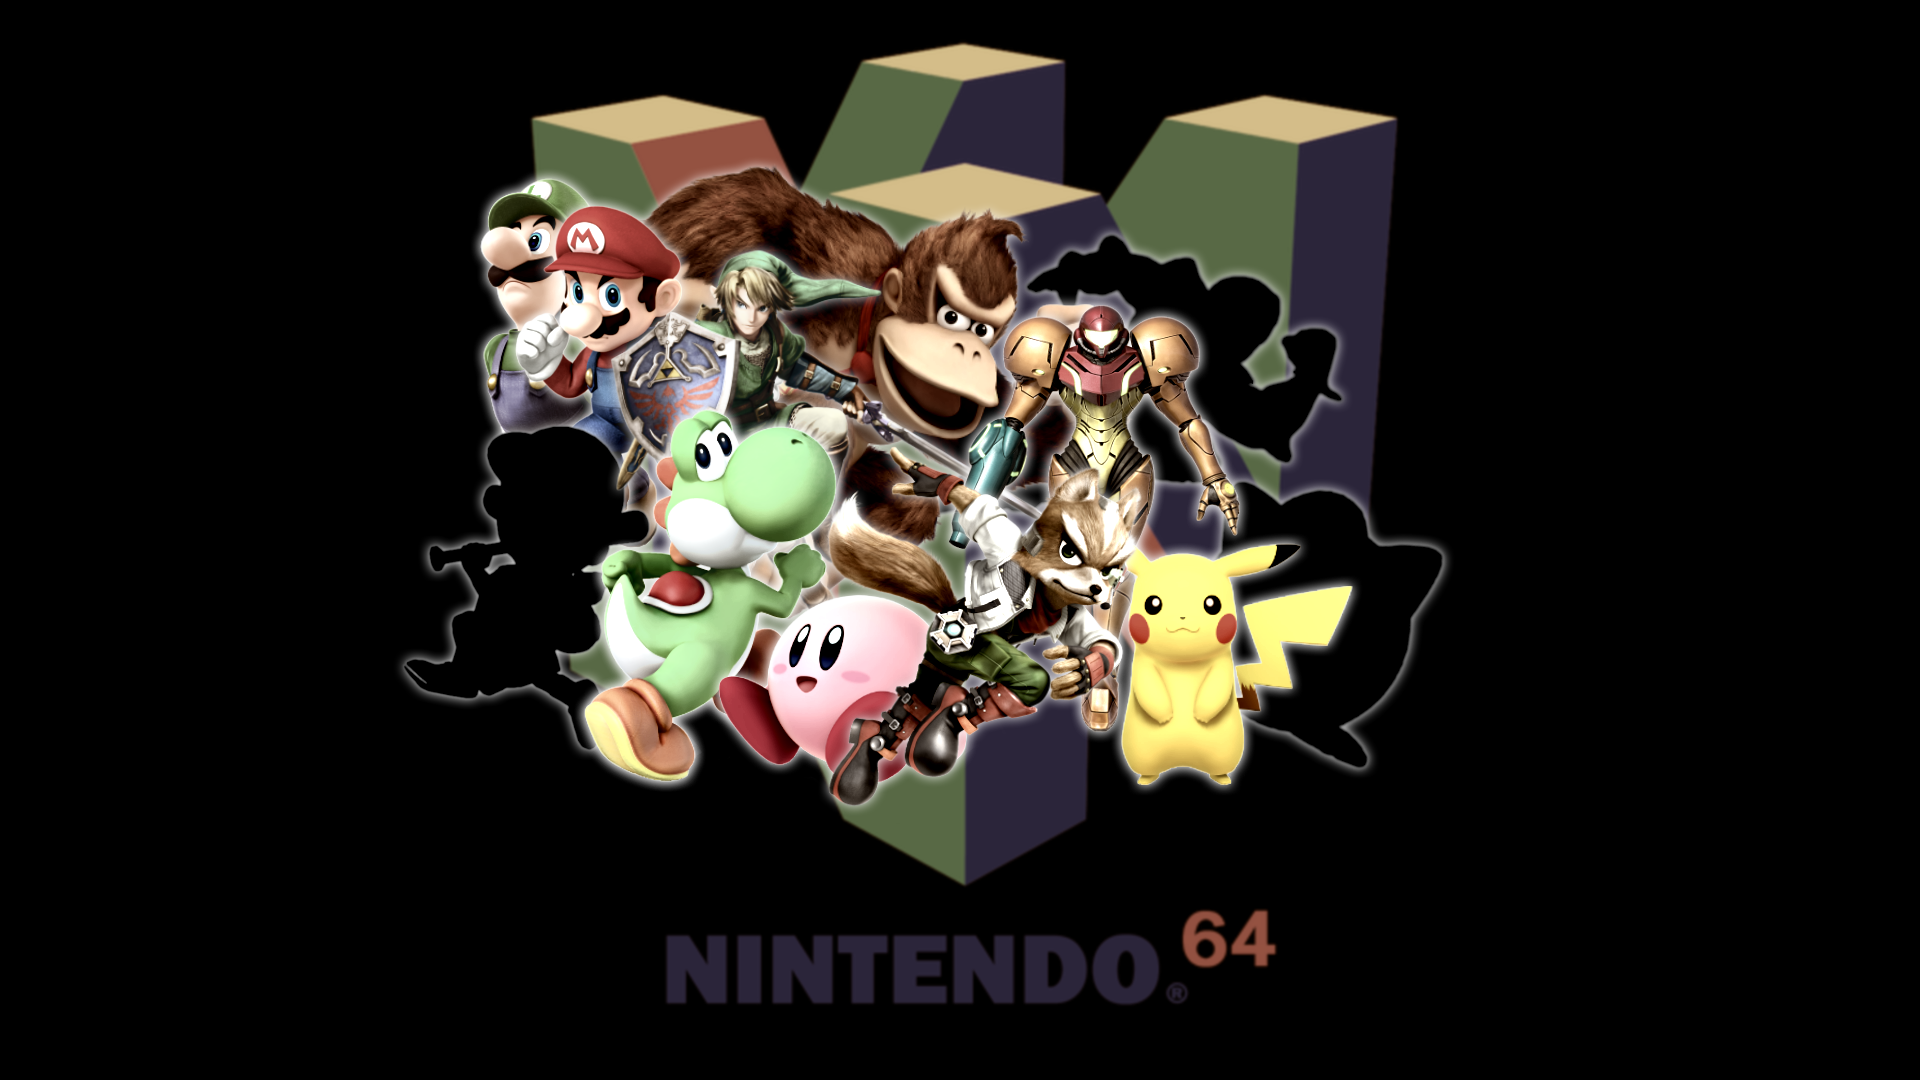 Super Smash Bros Desktop Background 1920x1080 By Cookedemil On